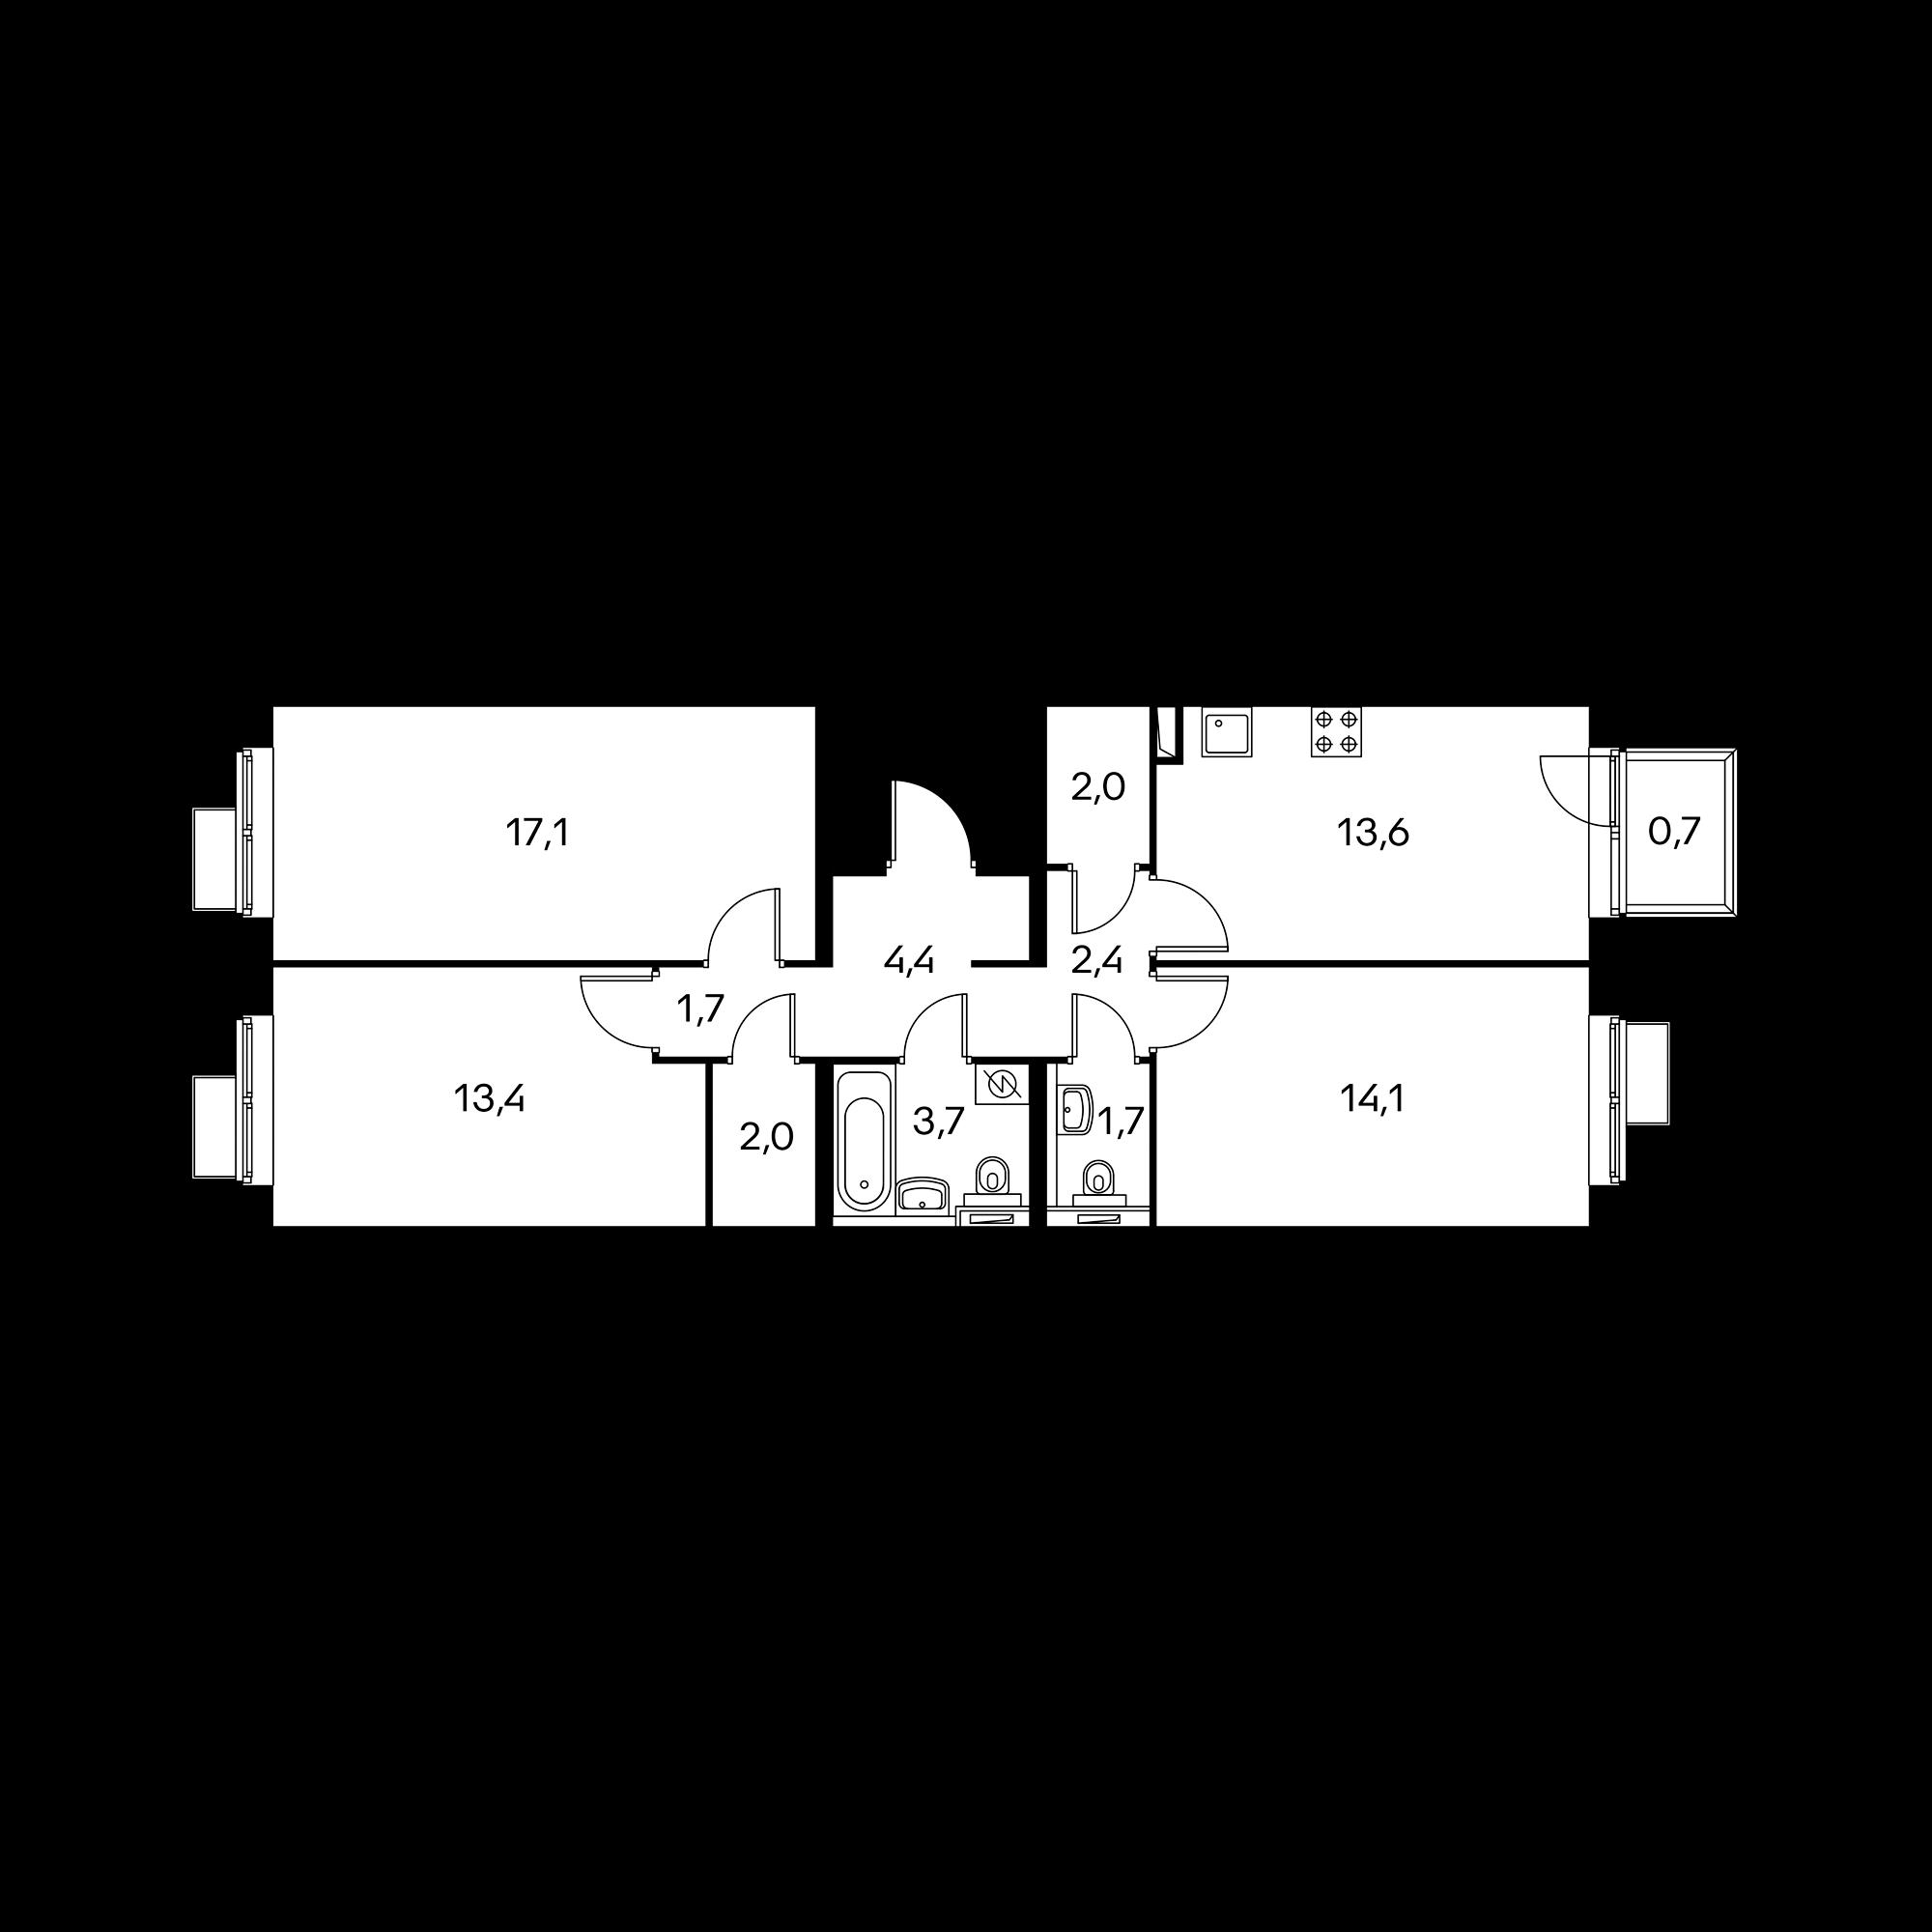 3KM15_6.0-1_S_ZB1